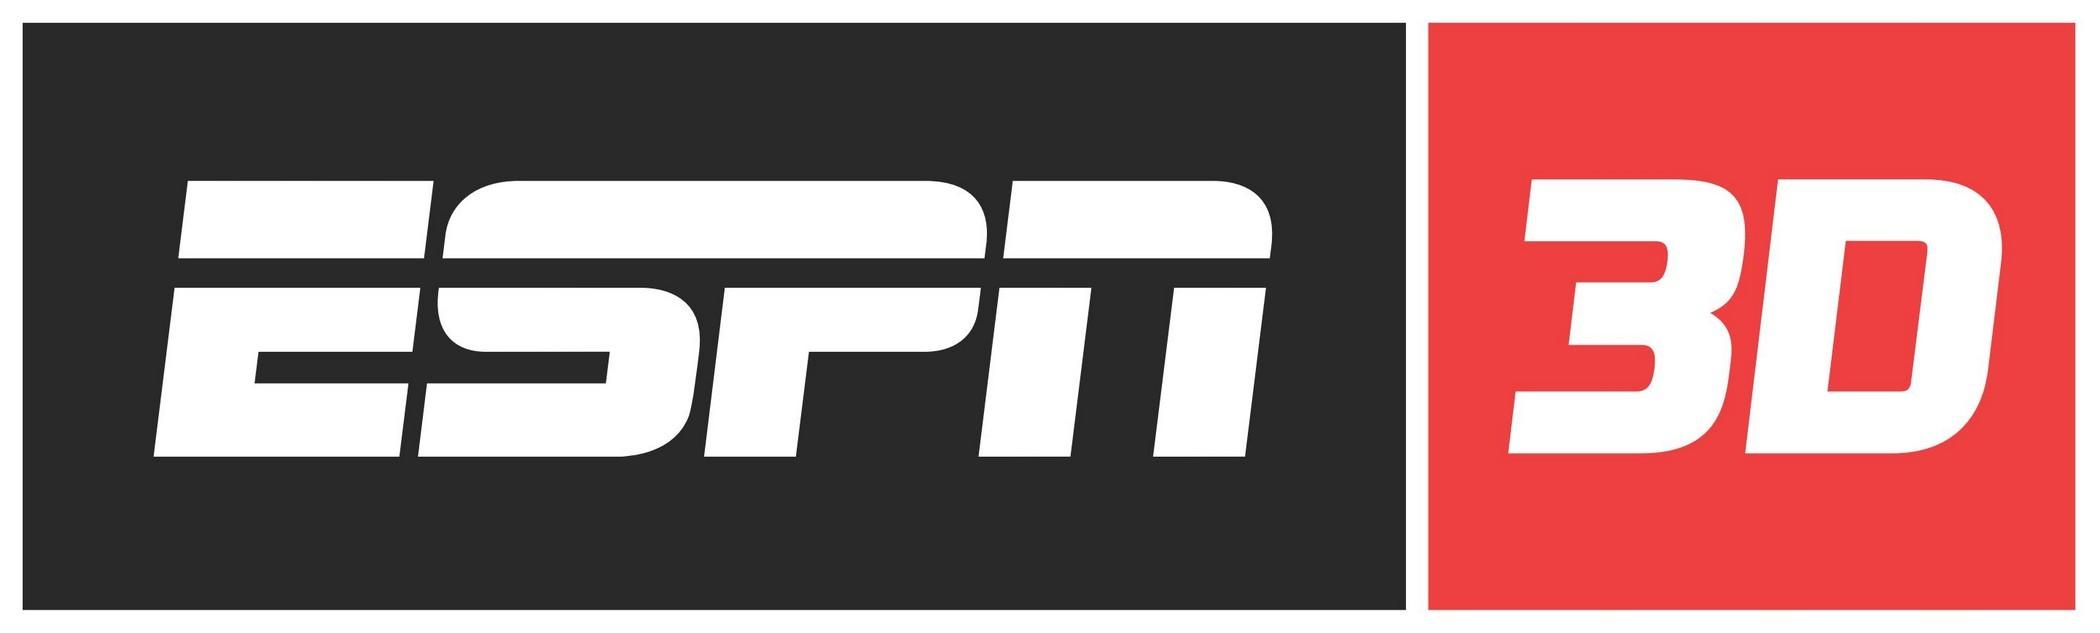 ESPN_3D_logo